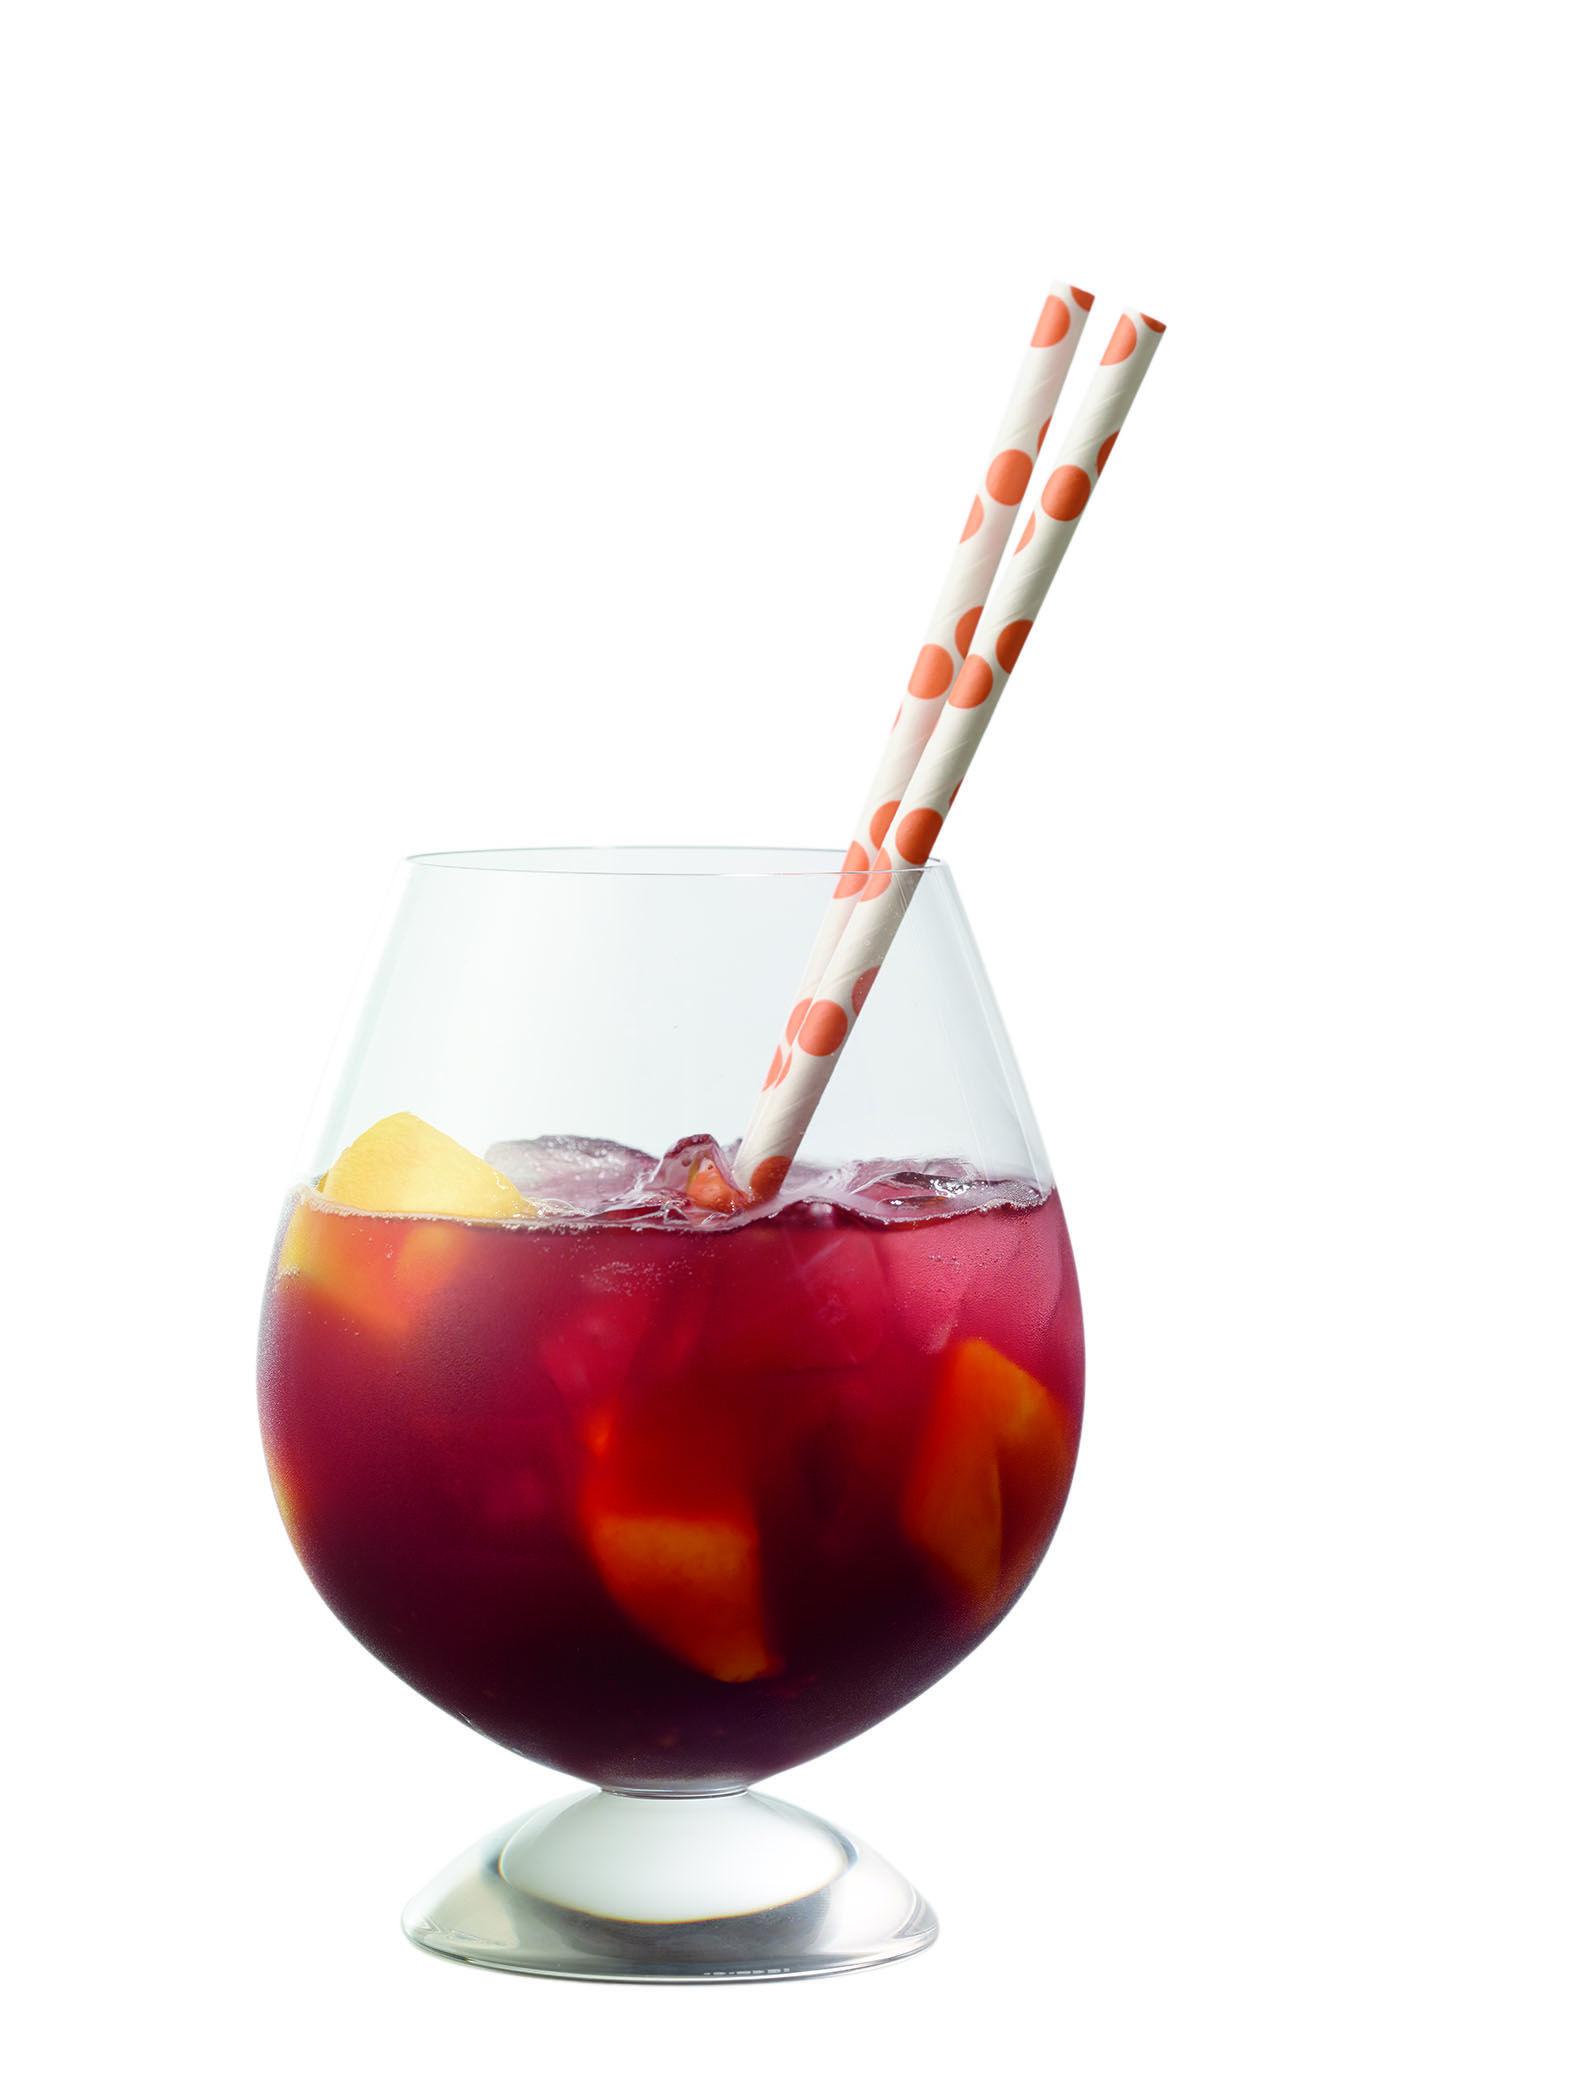 Malbec Mango Sangria Barefoot Wine Bubbly Borracho Tomando Vino